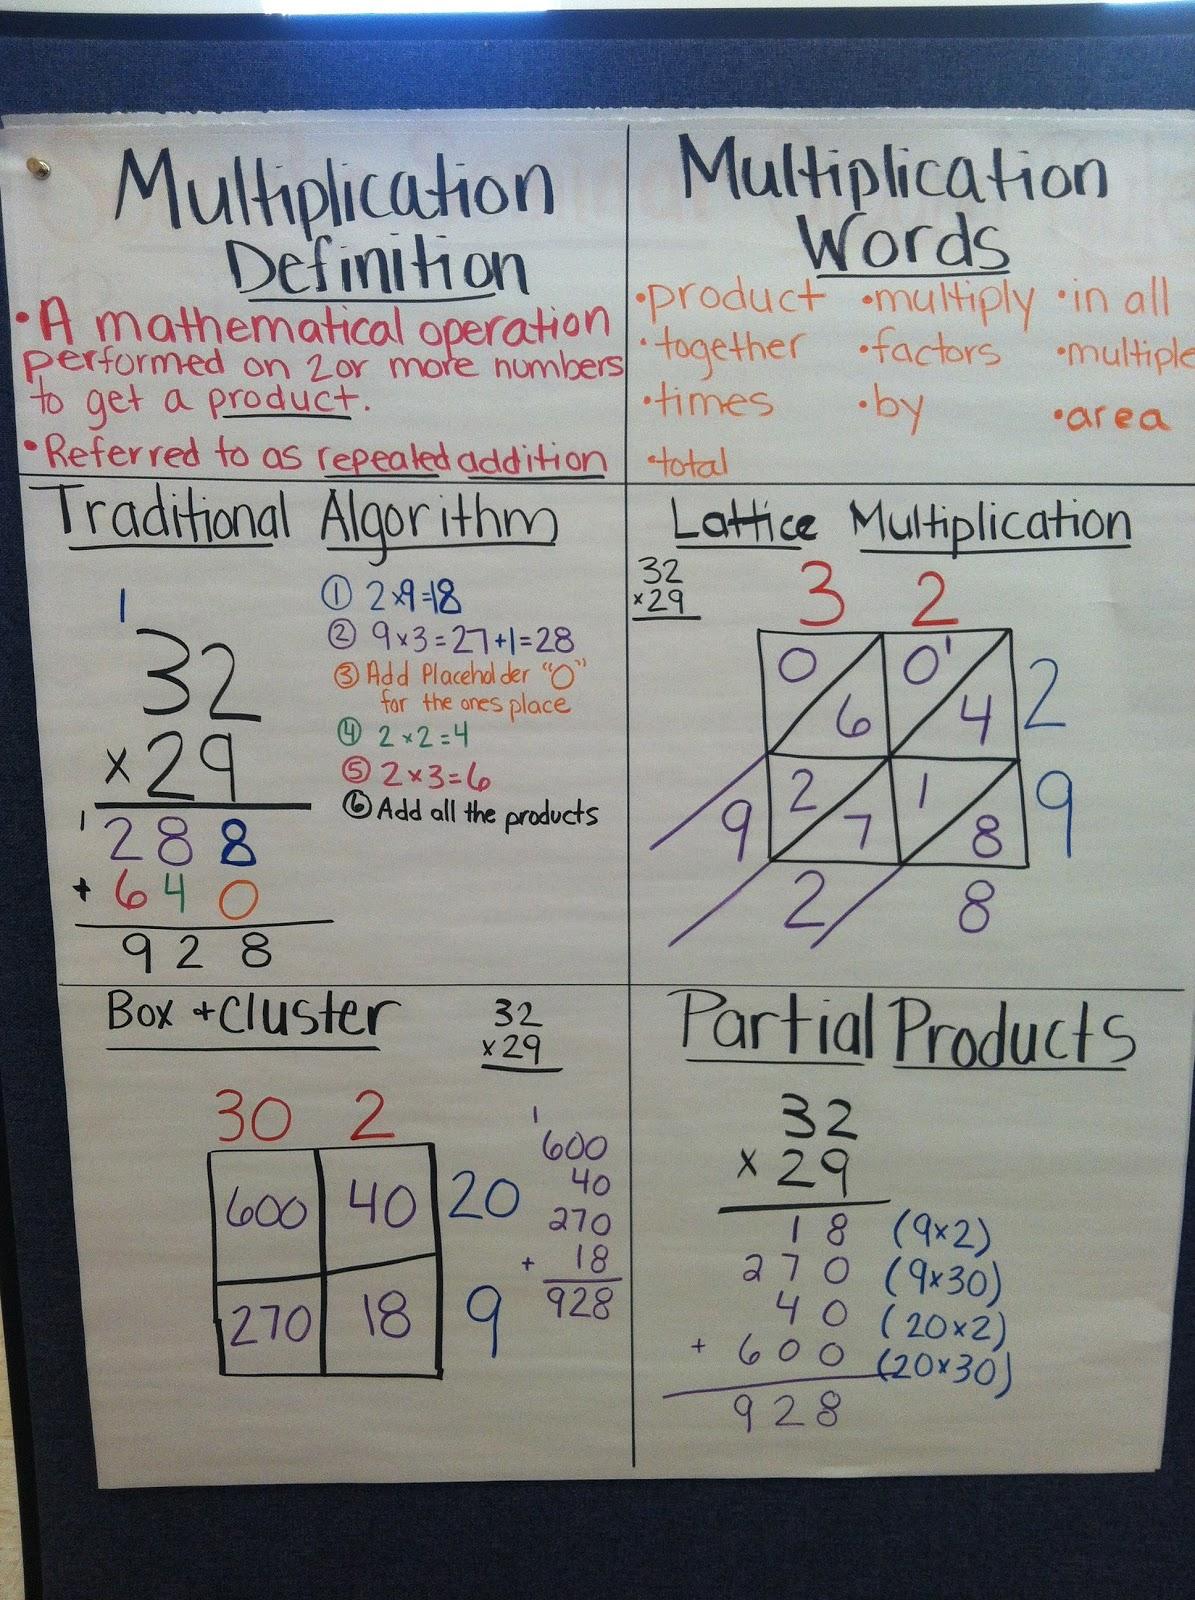 Multiplication Chart Multiplication And Hundreds Chart On